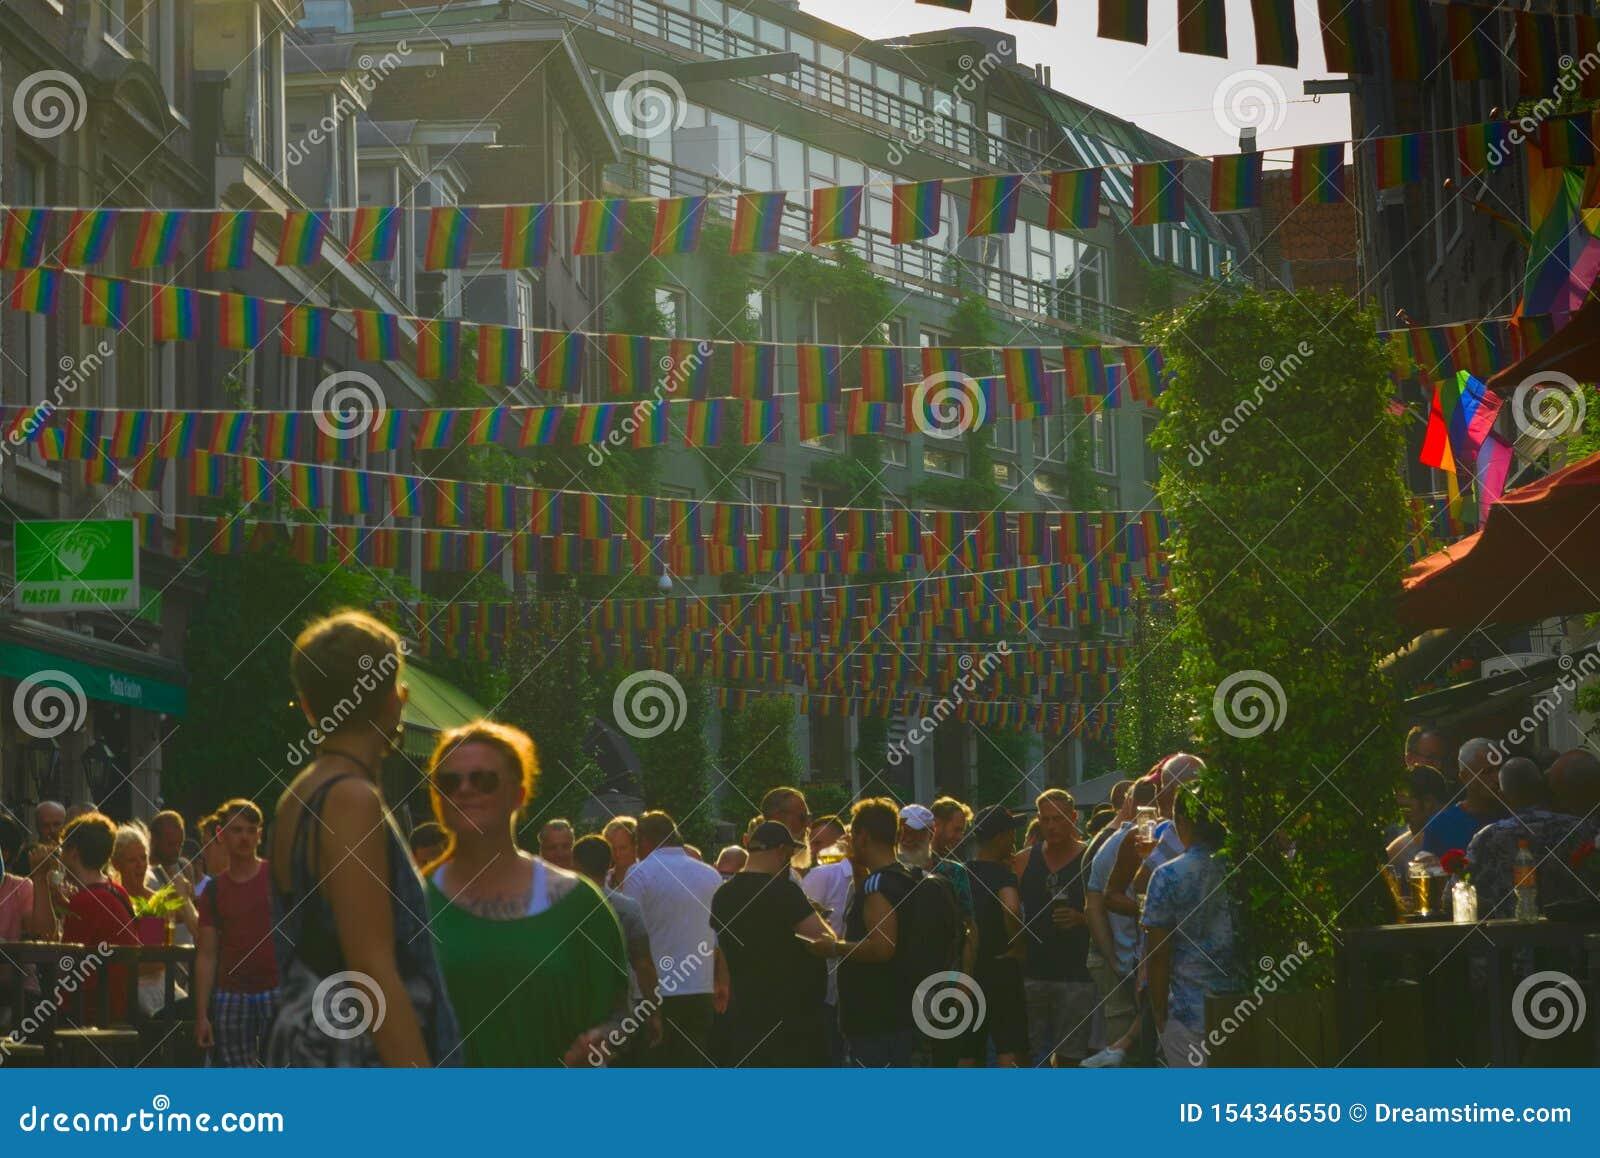 26-07-2019 Амстердам Нидерланд Амстердам подготавливают на гей-парад 2019